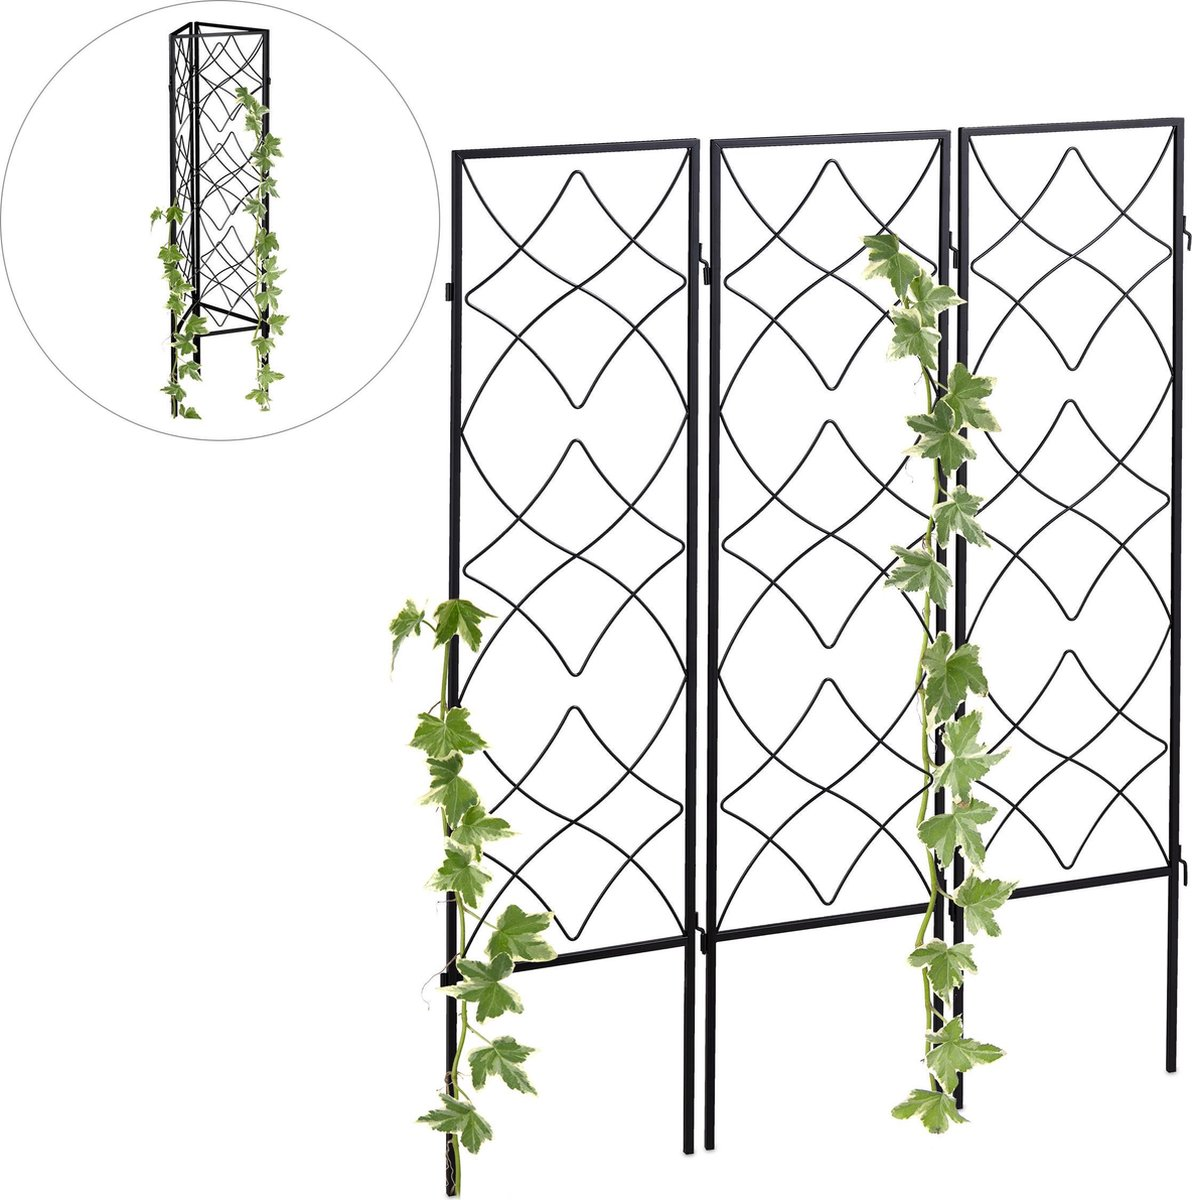 relaxdays klimplantenrek - 3 stuks - plantensteun - metaal - klimplantensteun - plantenrek